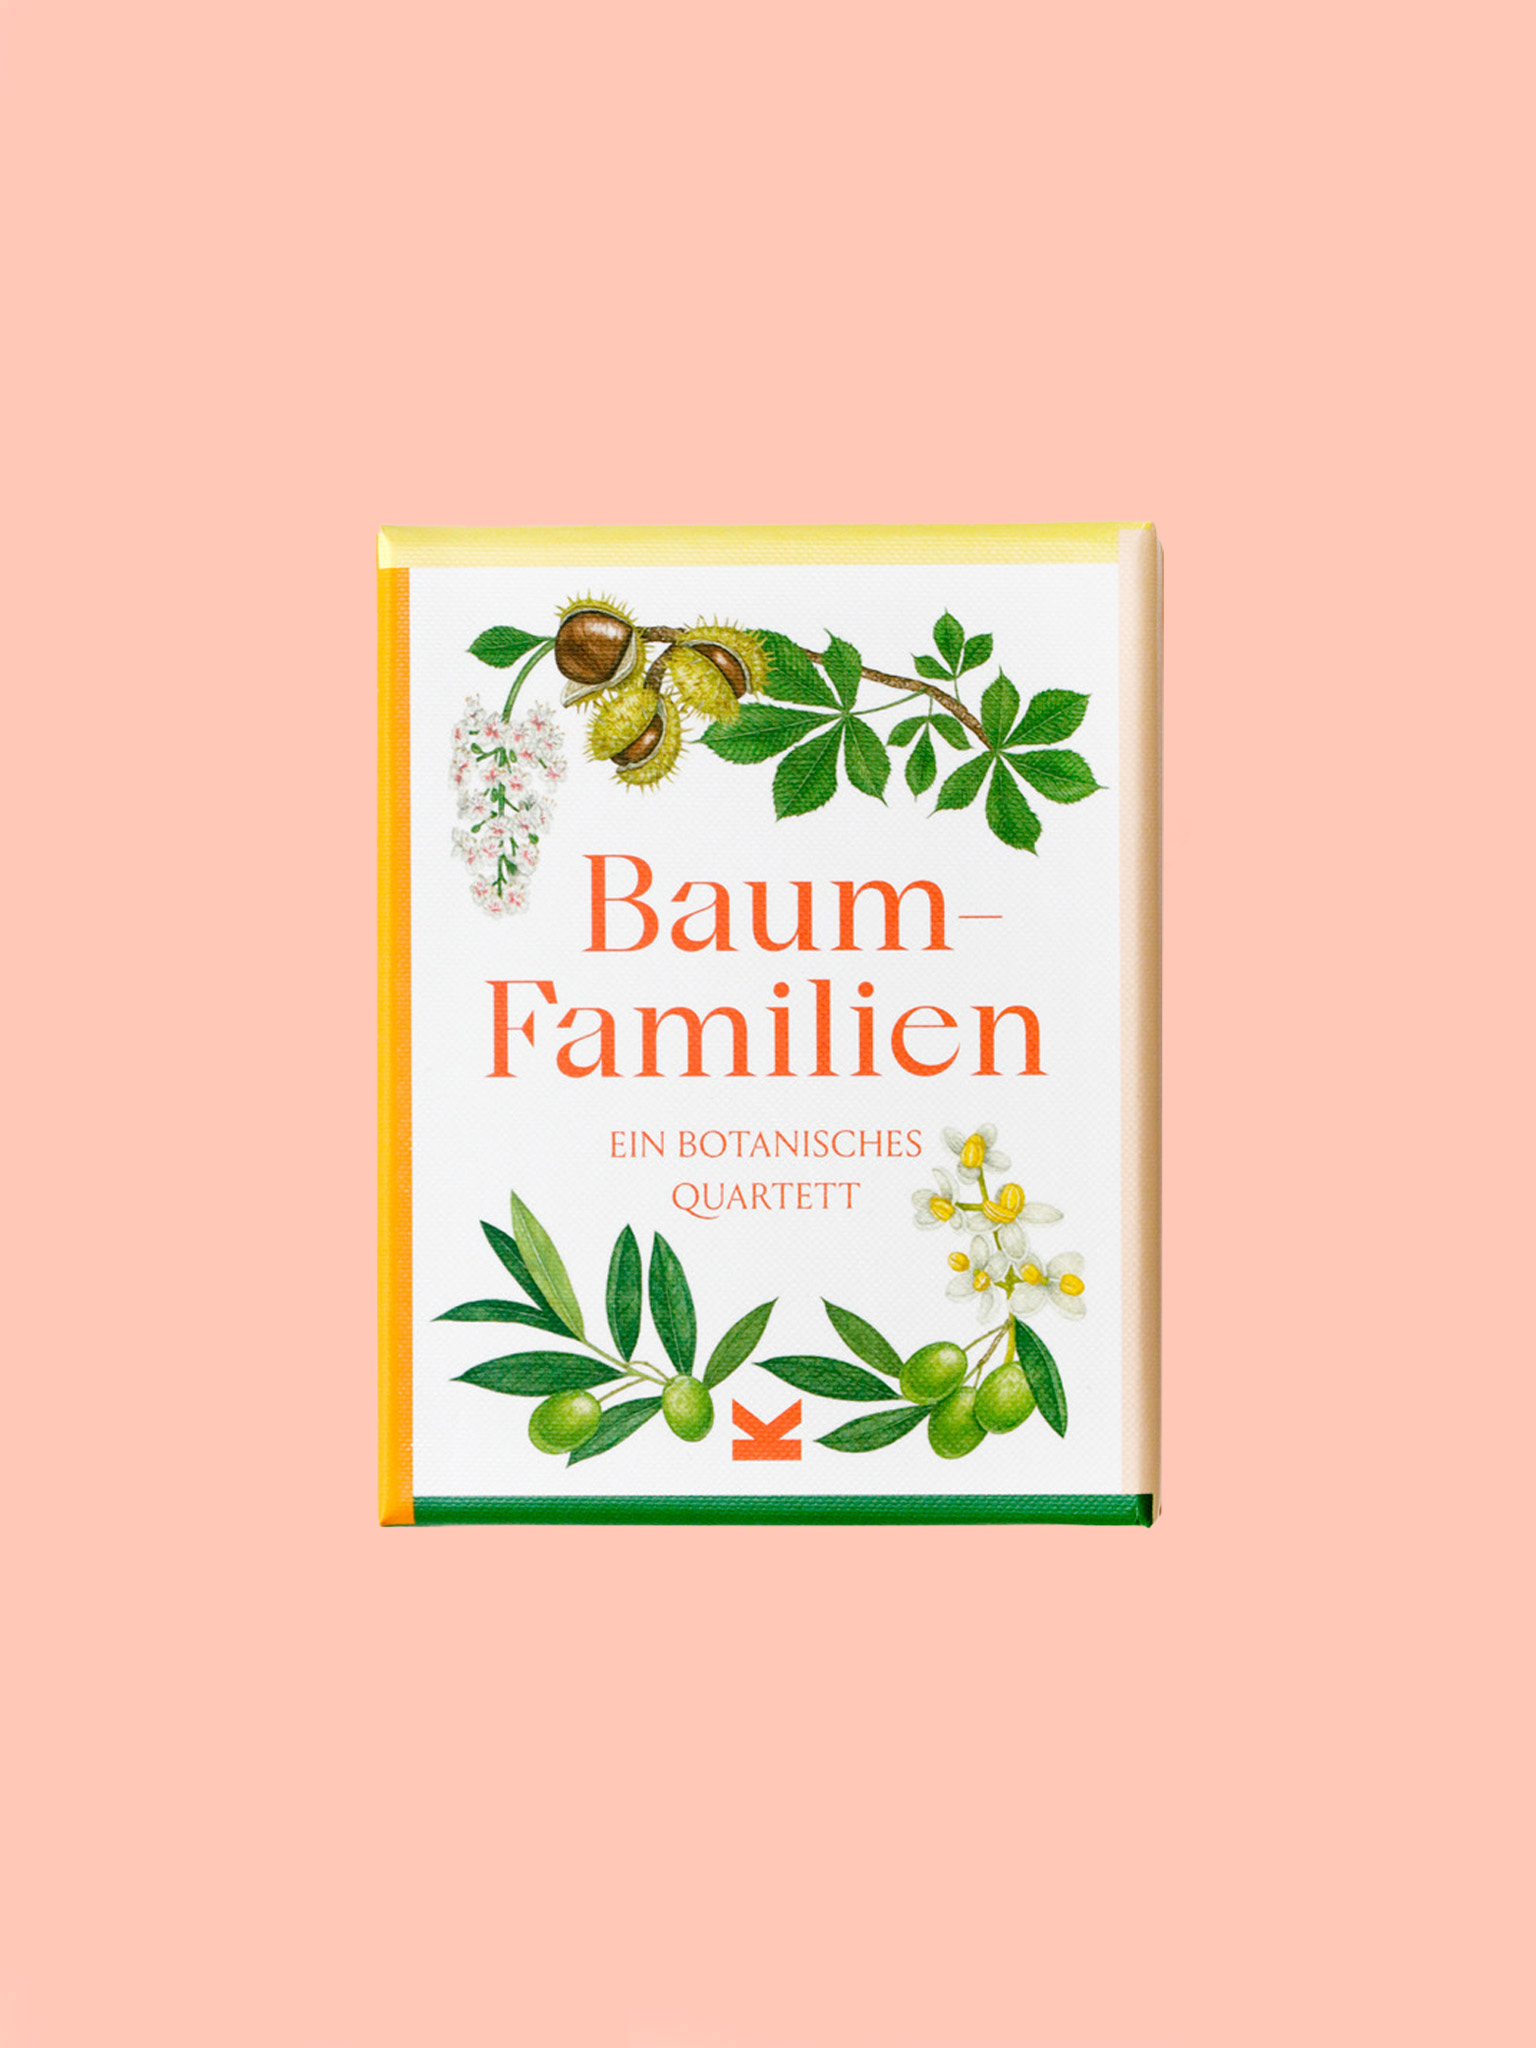 Laurence King Baum Familien